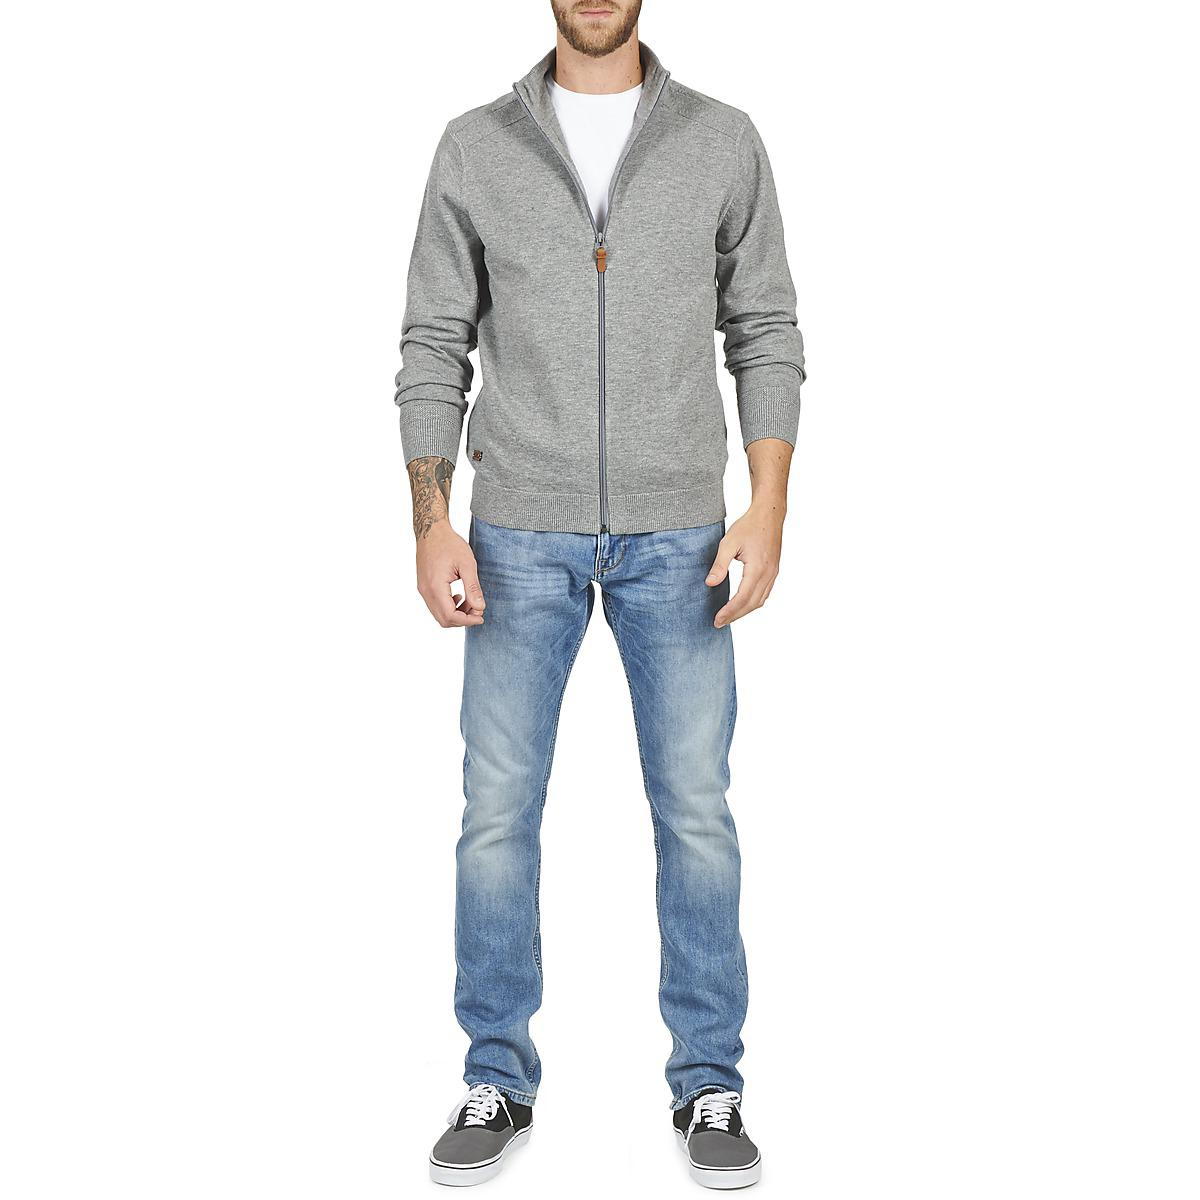 Oxbow Pamiut Men's In Grey in Grey for Men